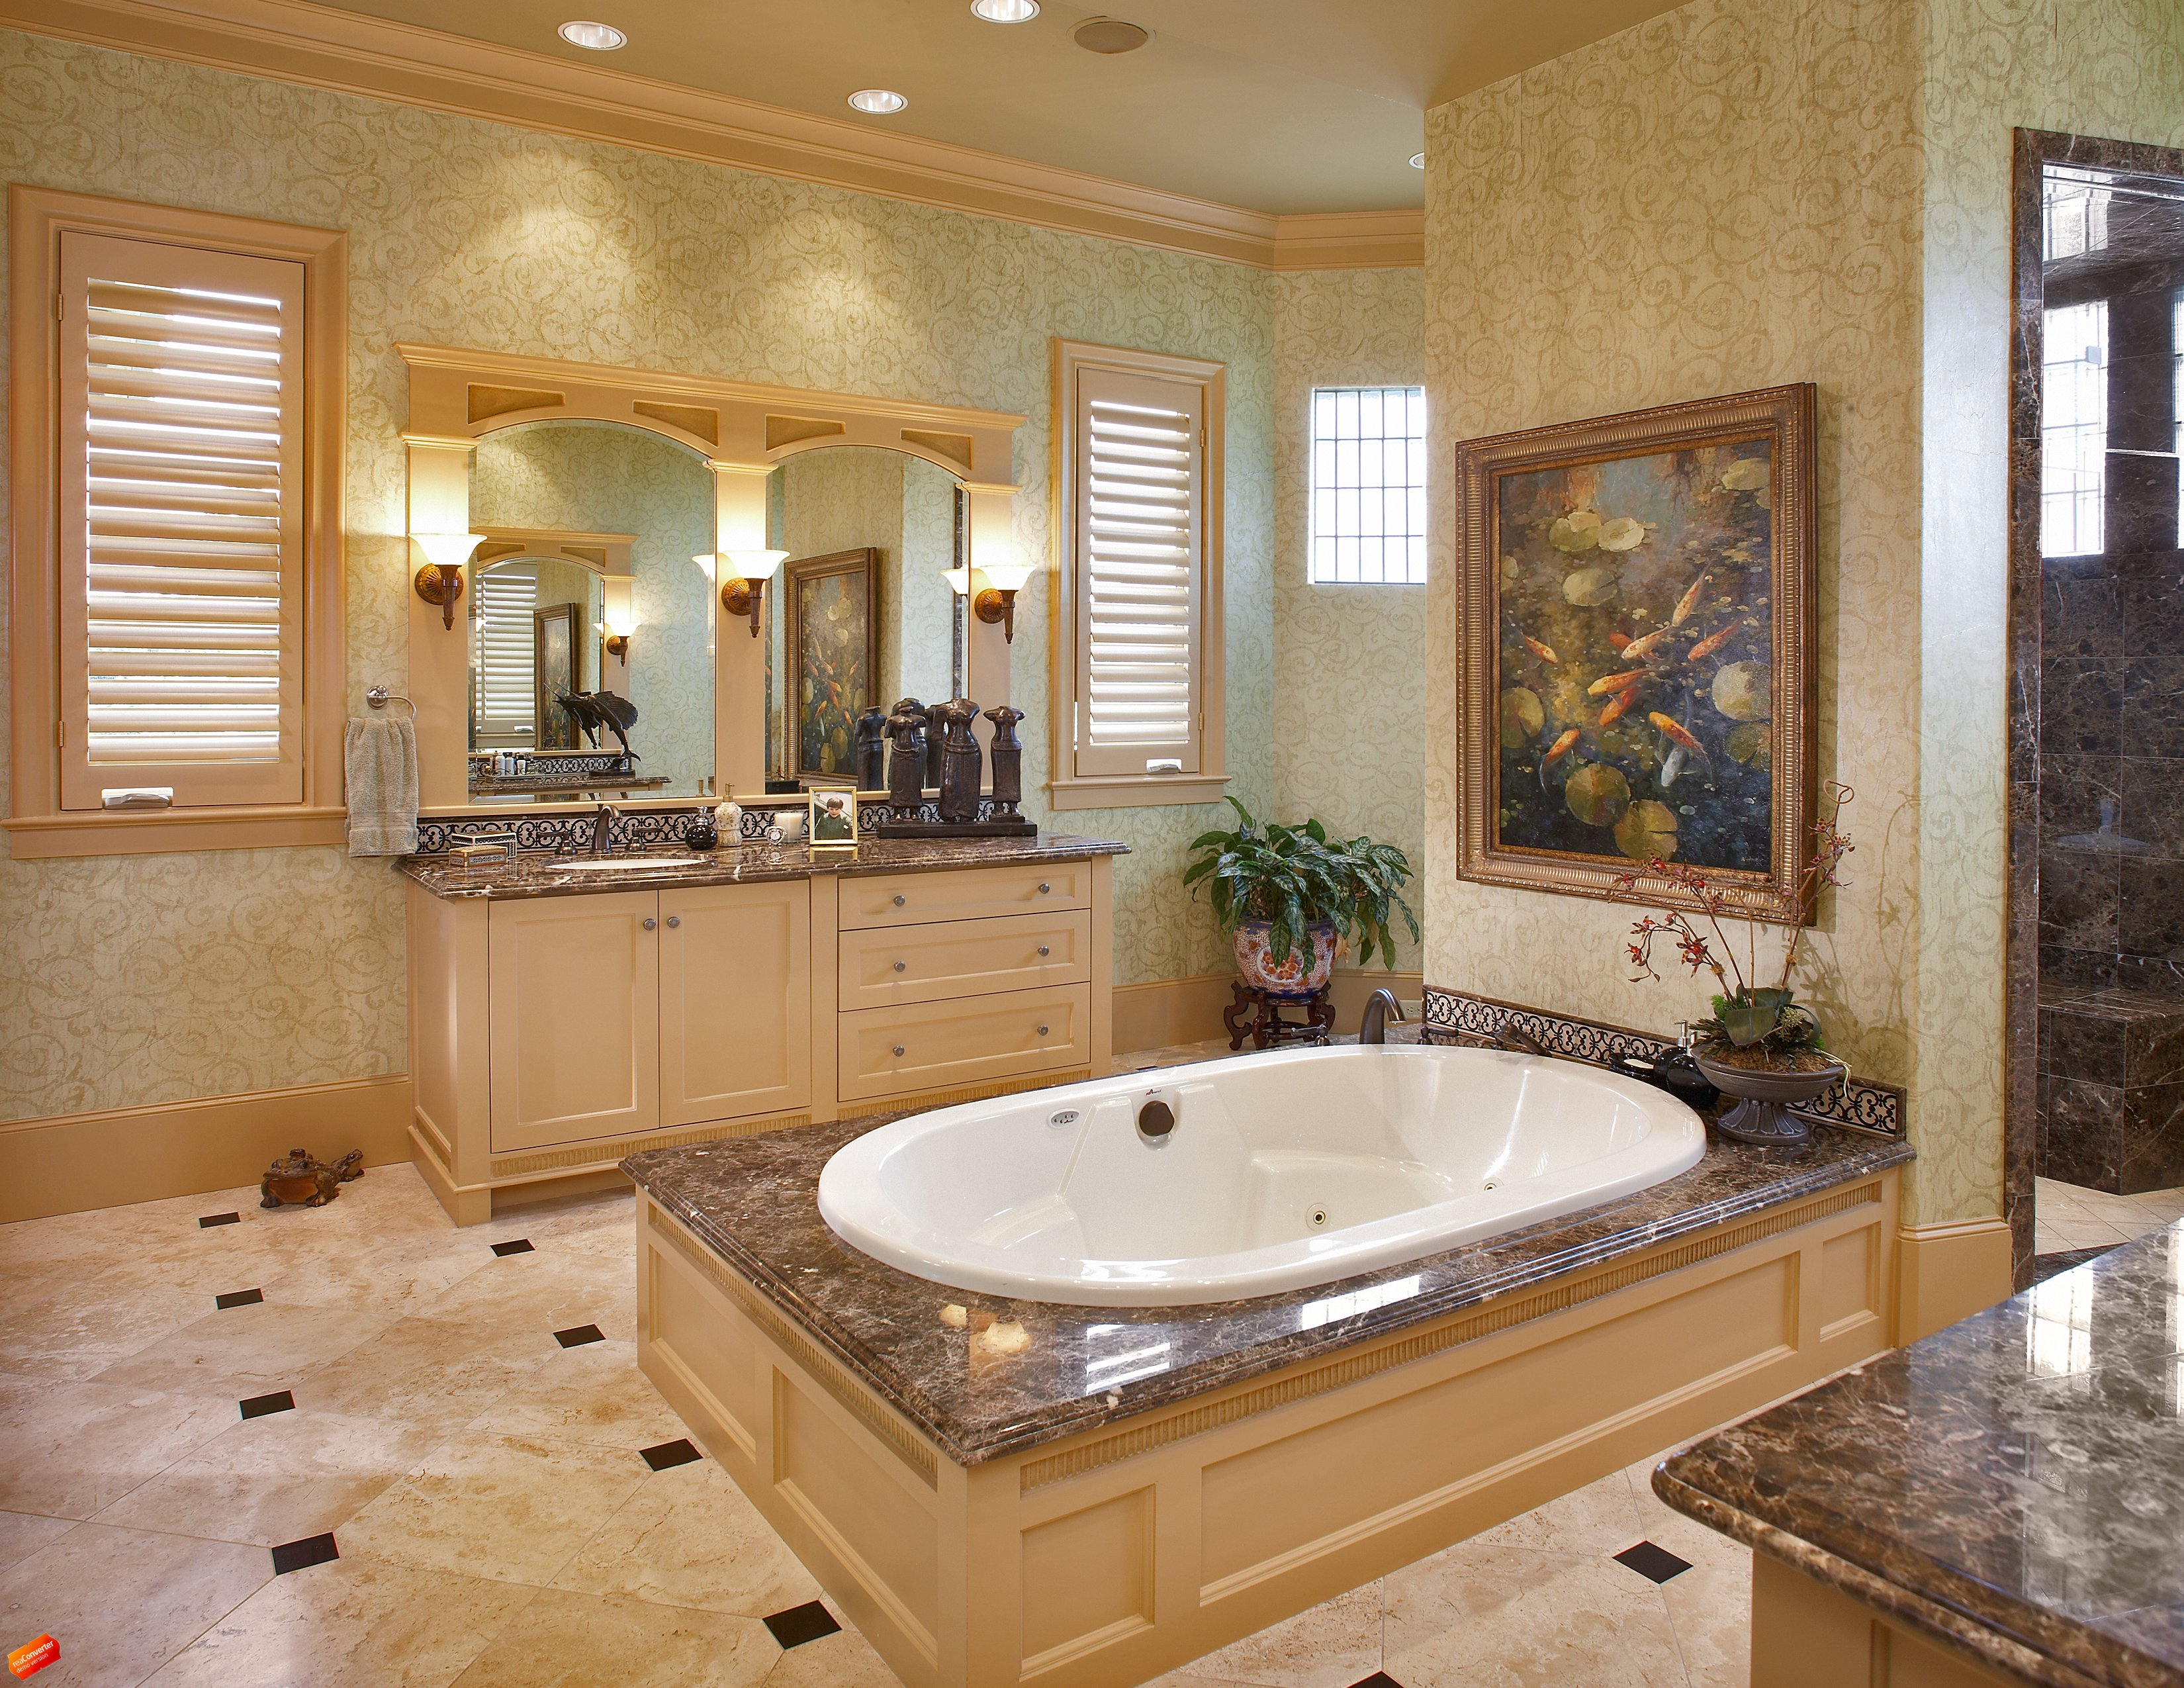 McCowen-Sainton Master Bath